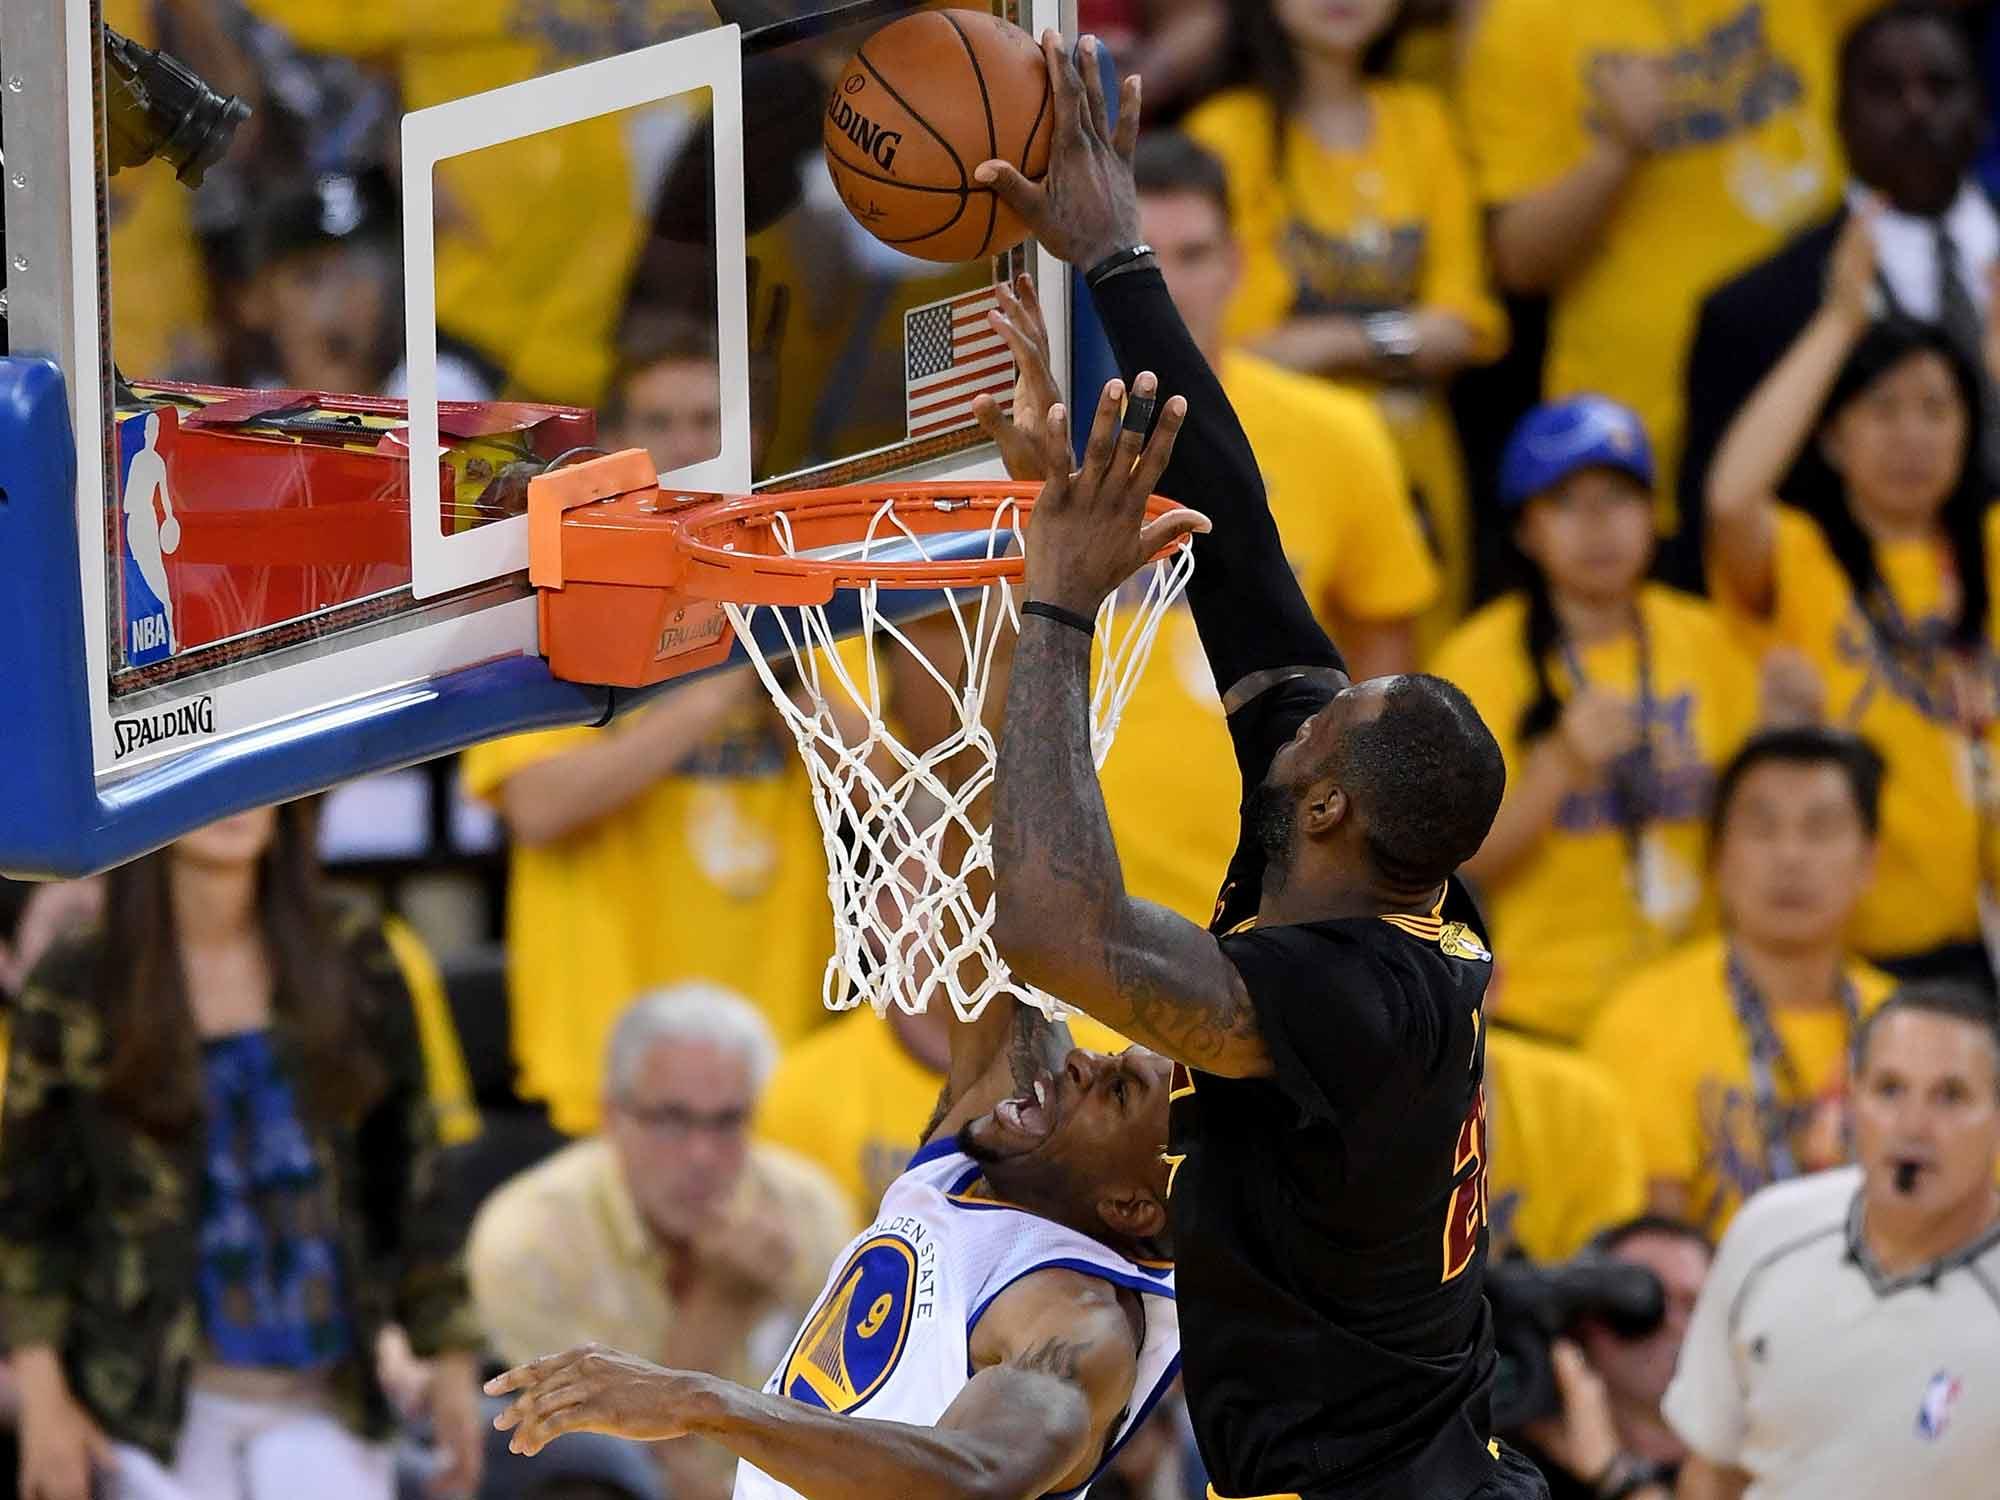 NBA In 2016: Kobe's Farewell, LeBron's Block Top Best Moments | SI.com